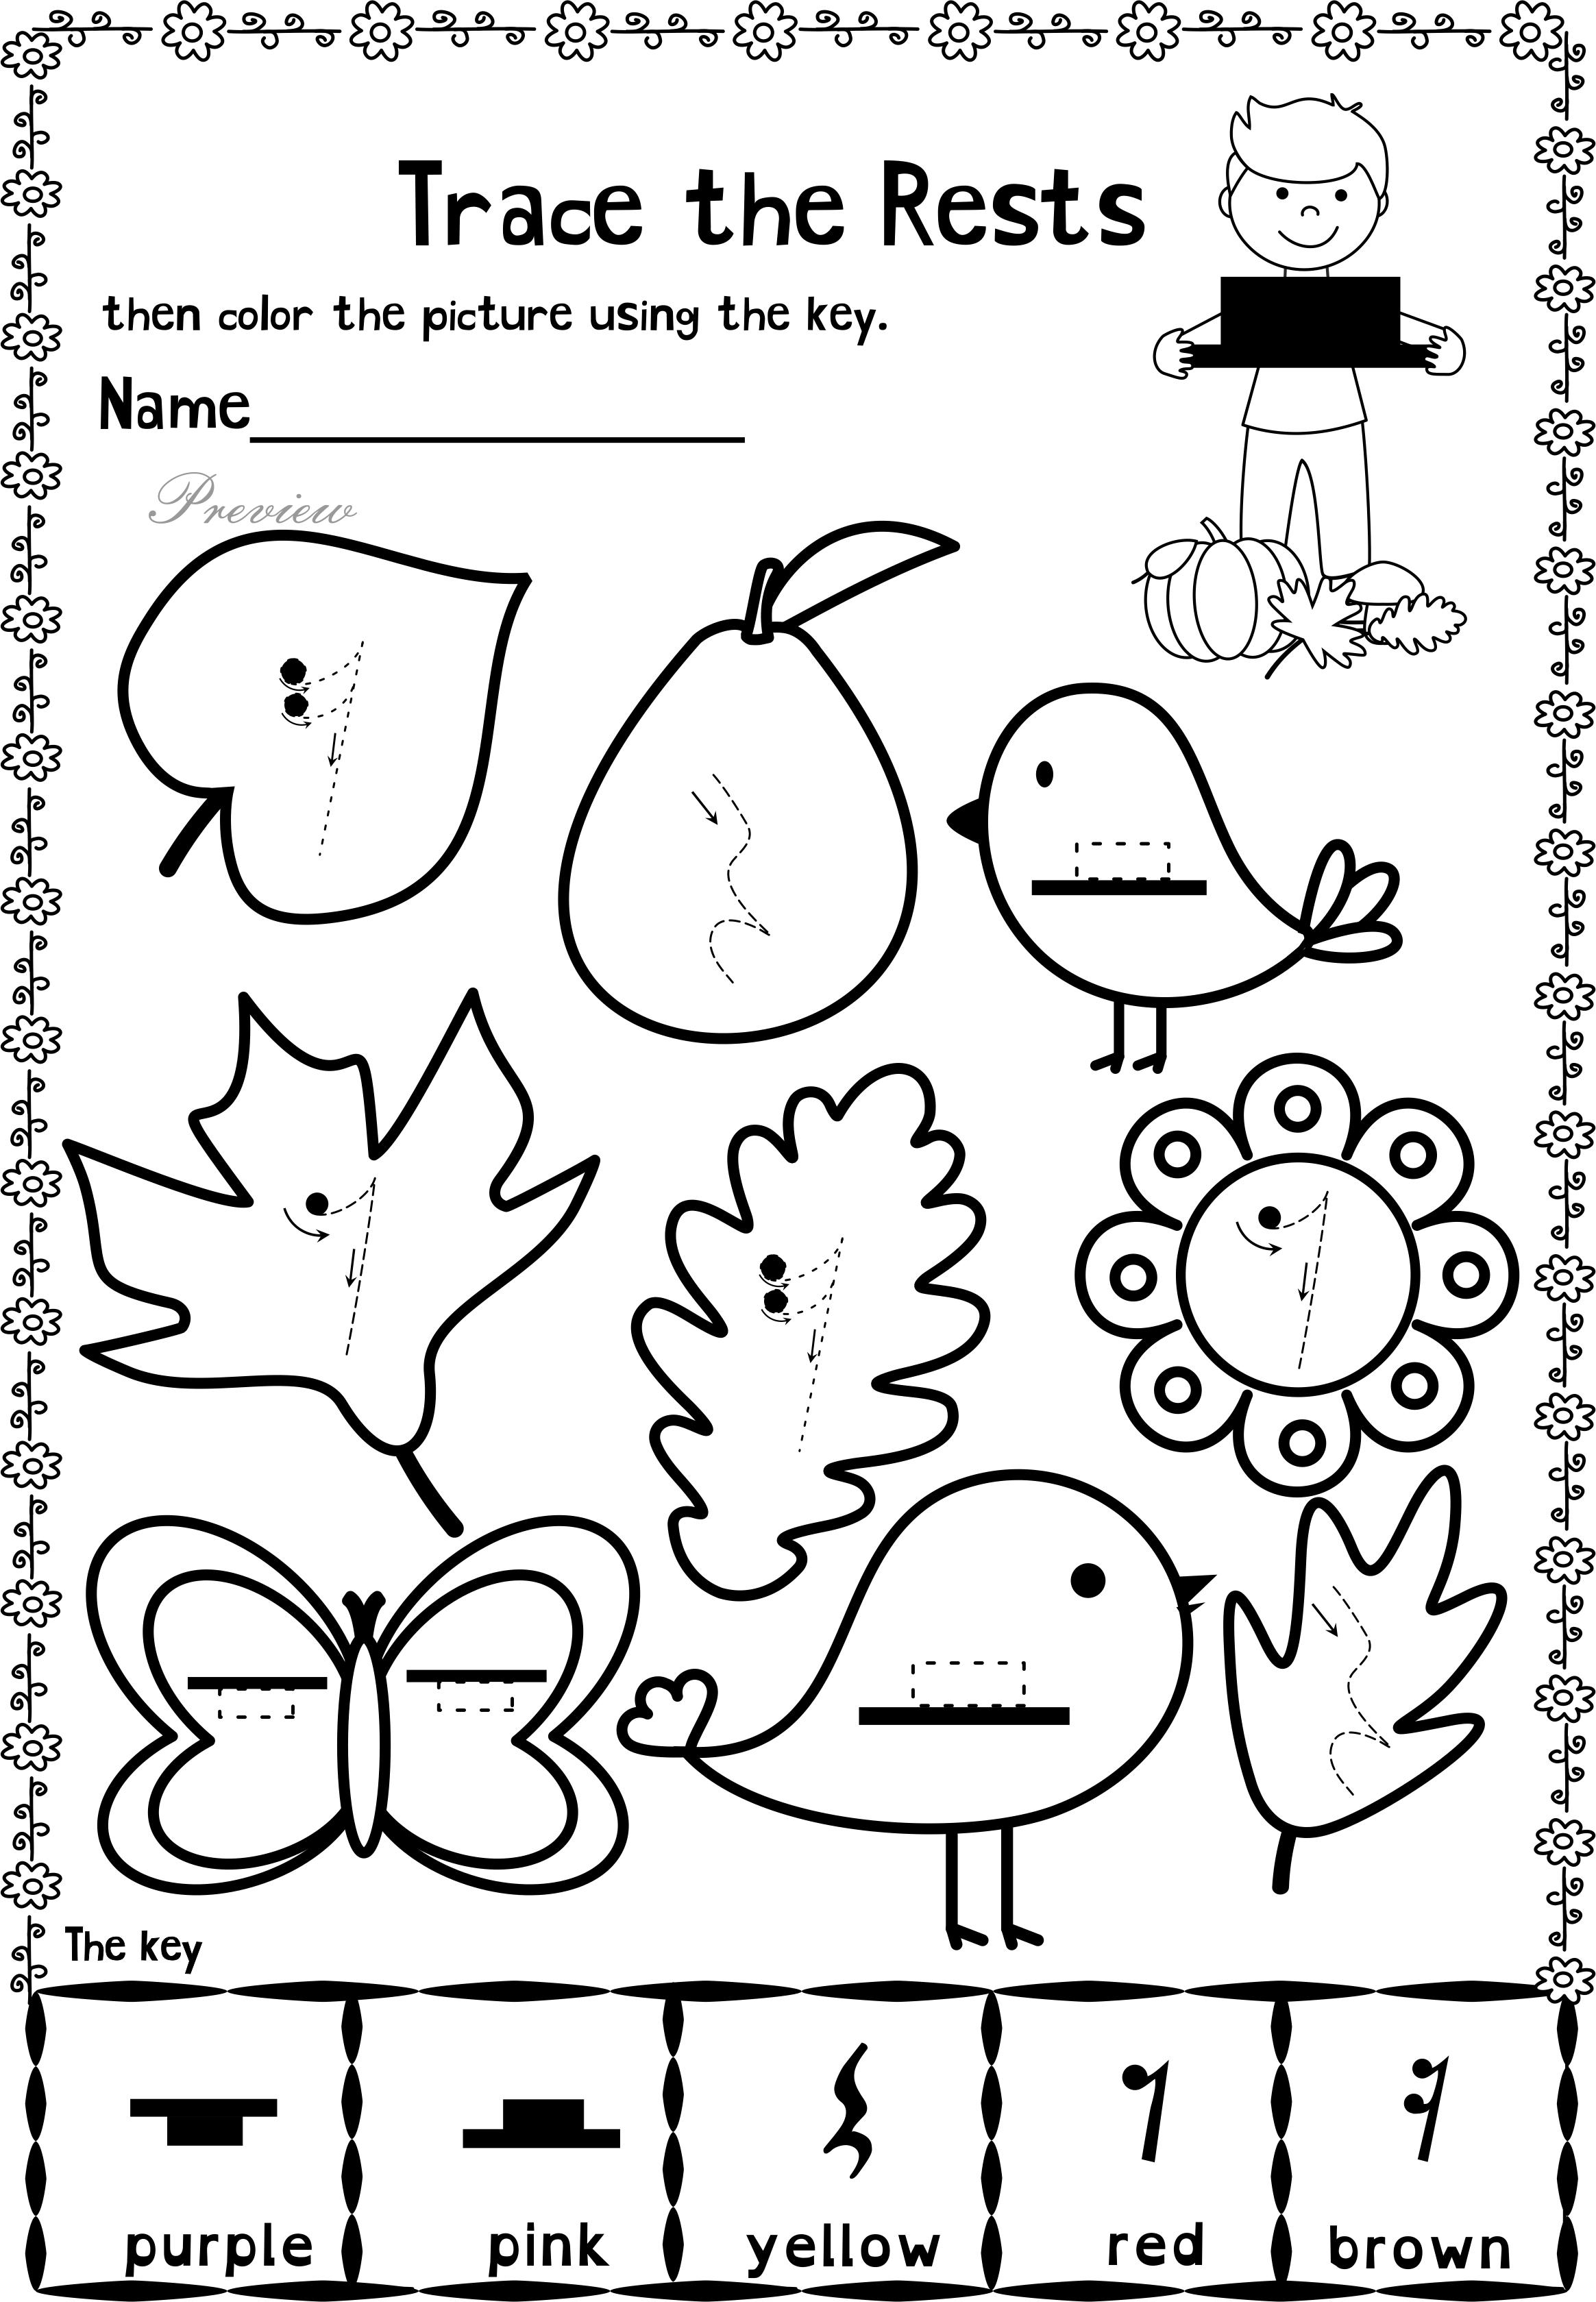 worksheet The Color Purple Worksheets fall trace and color music worksheets worksheets